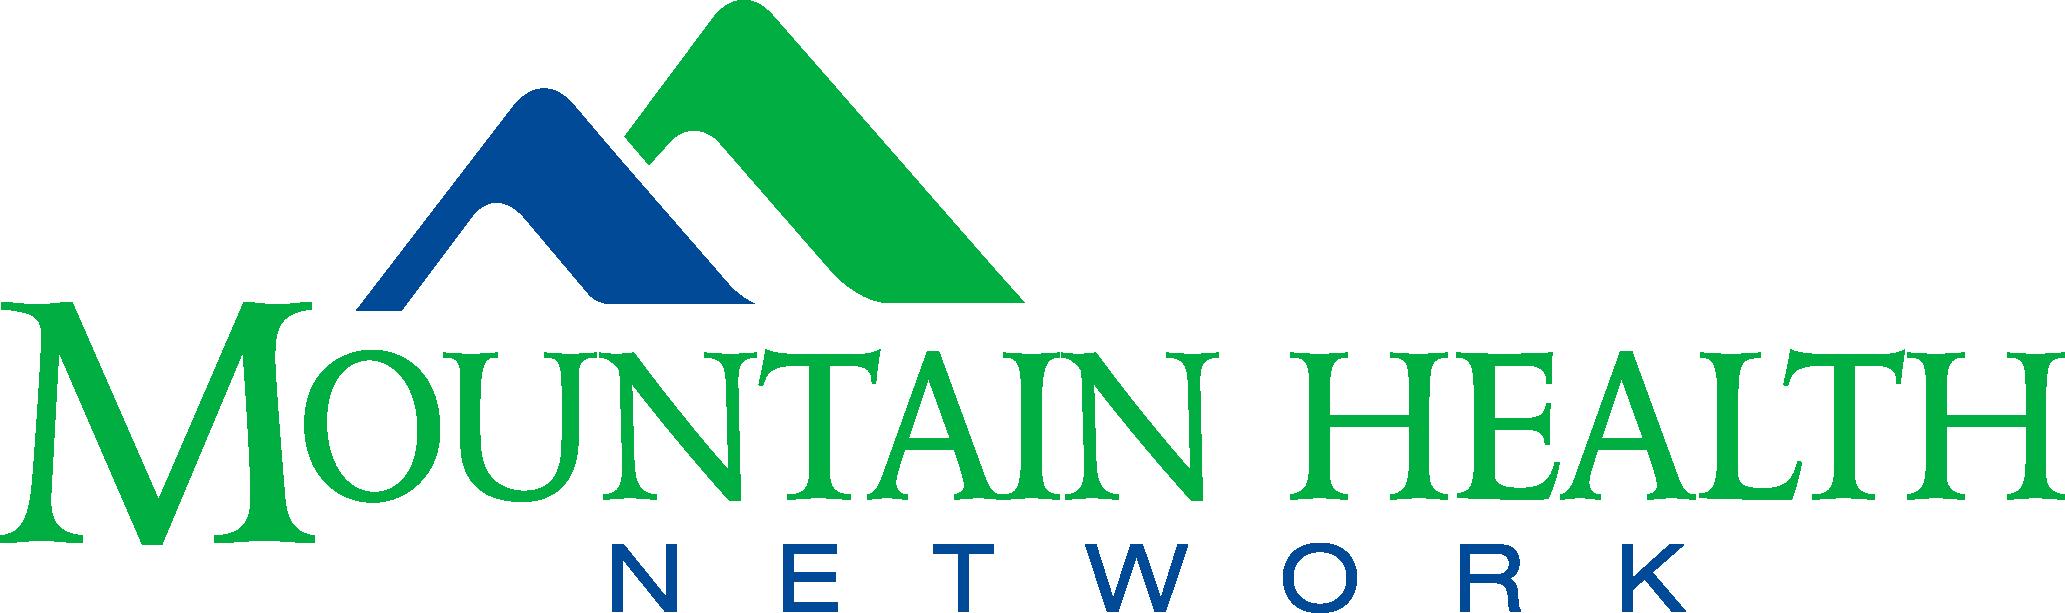 Mountain Health Network logo